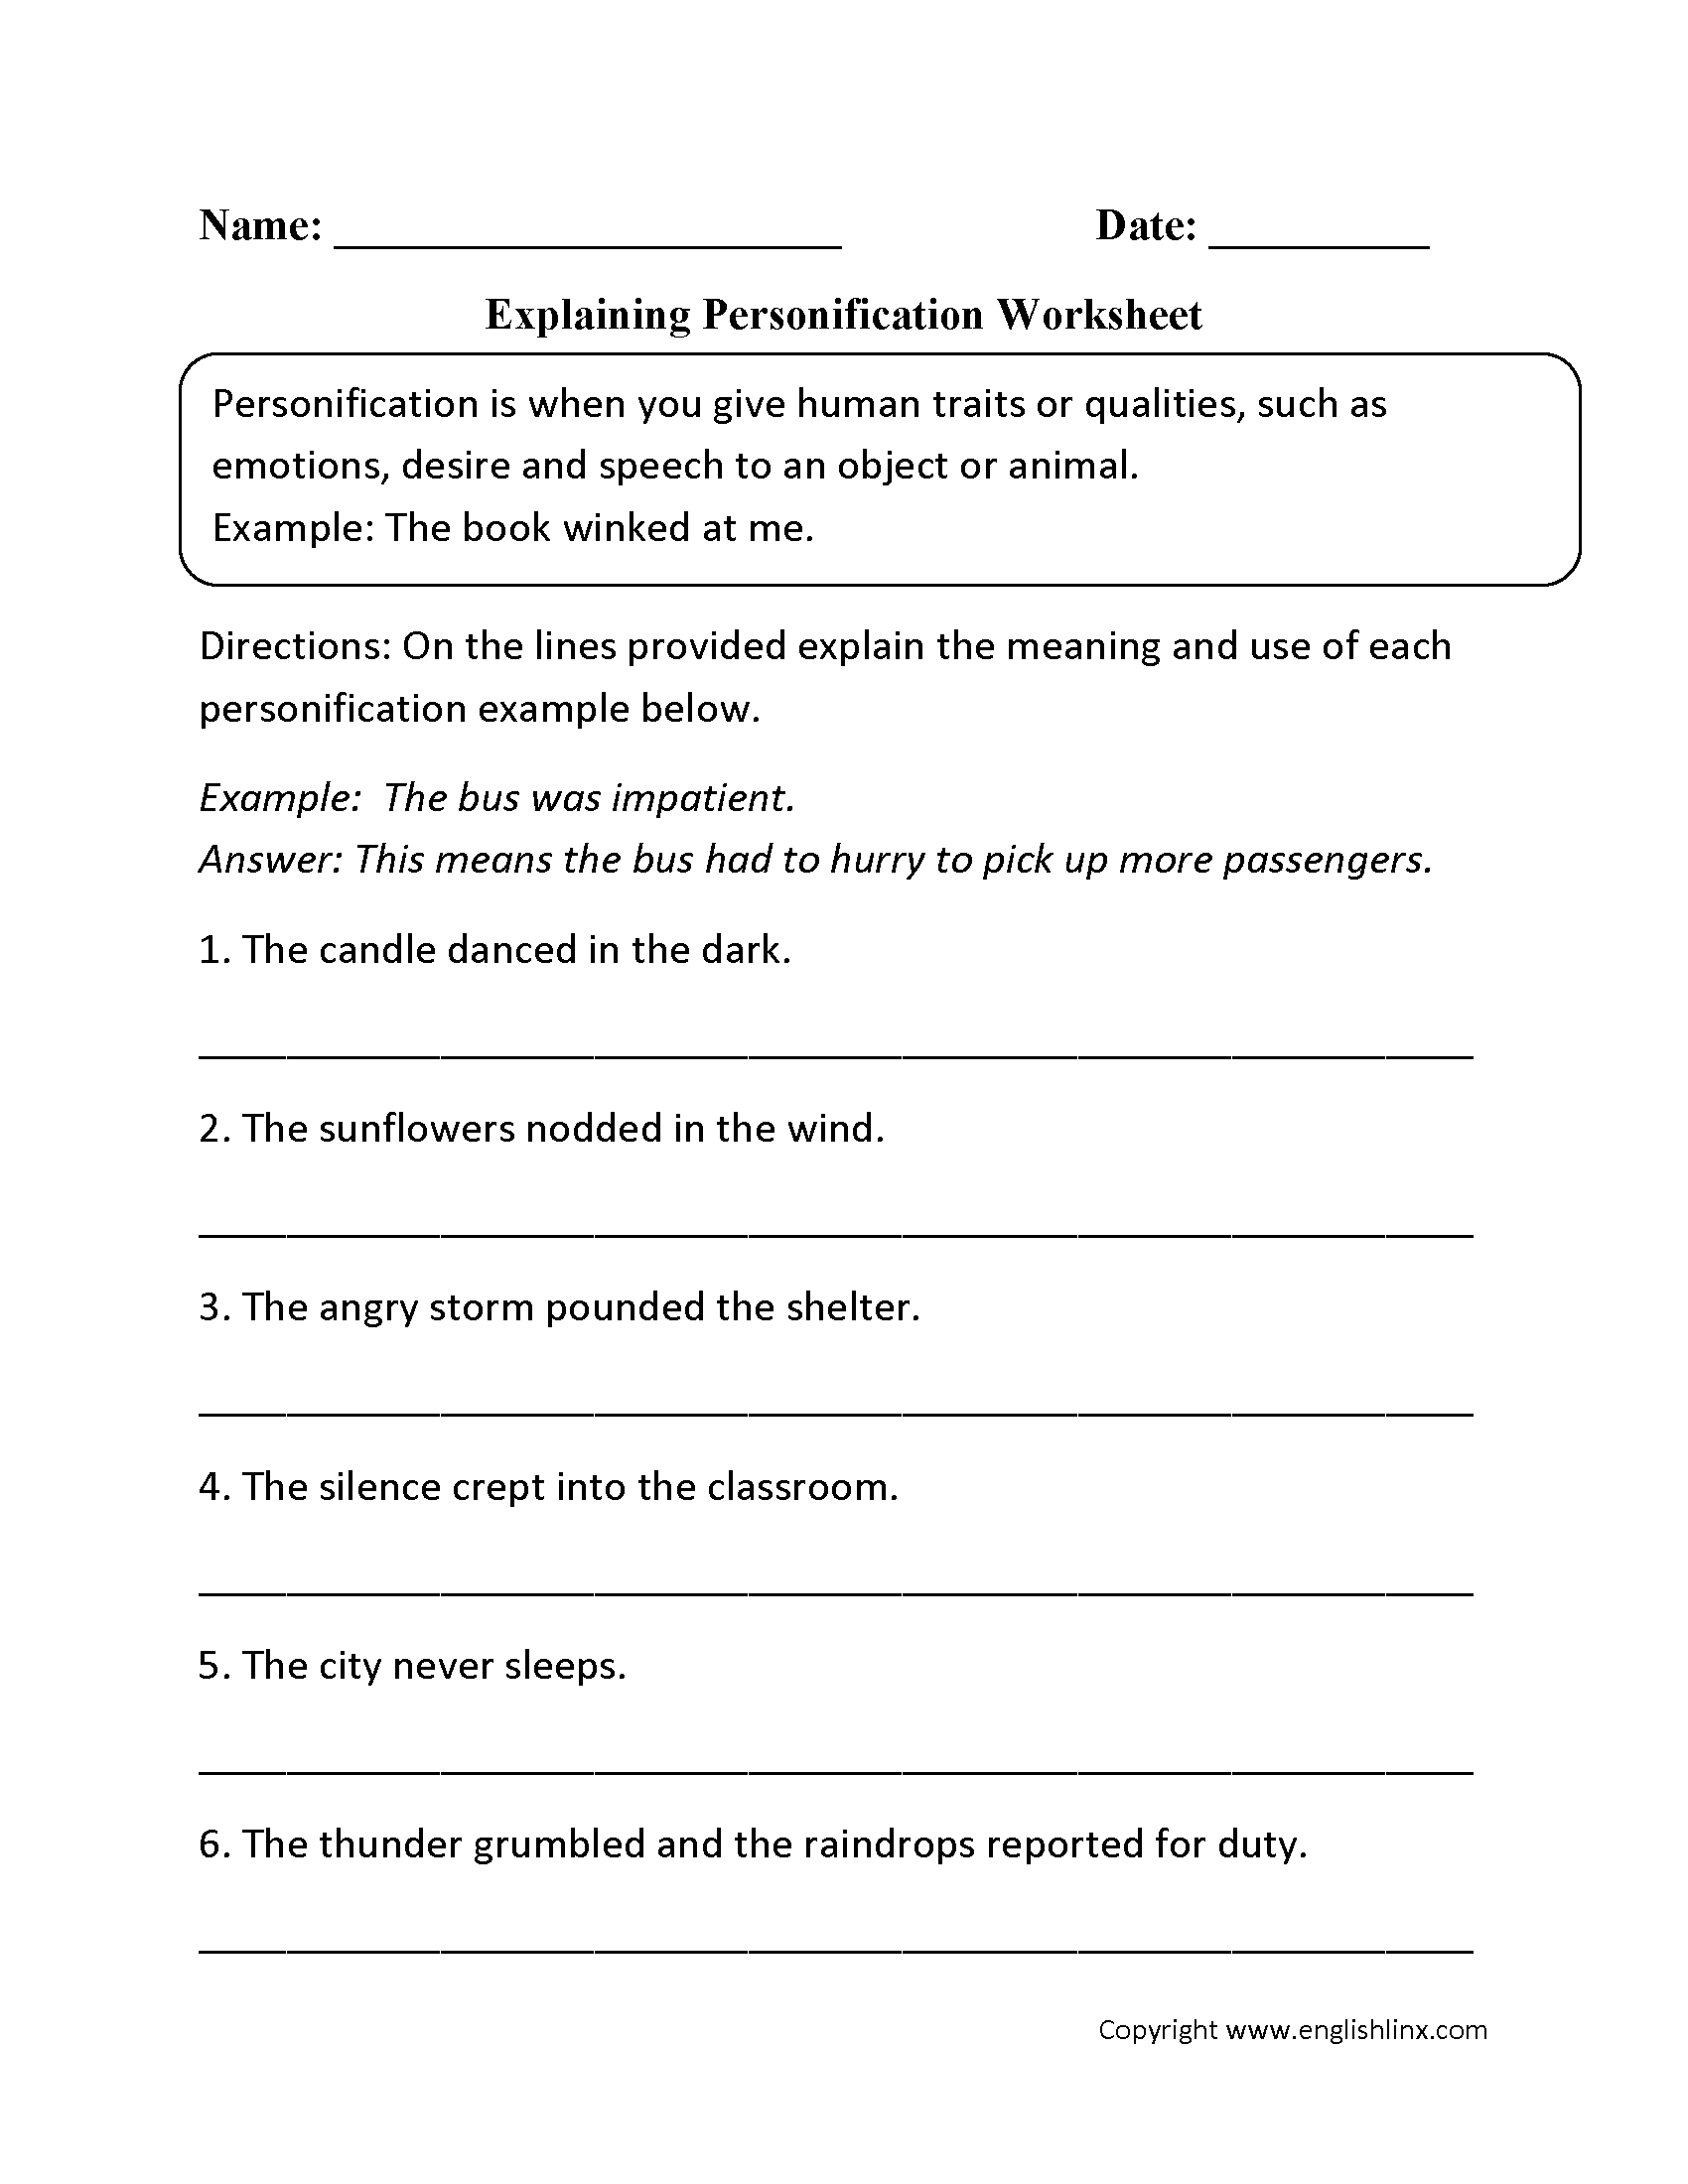 Explaining Personification Worksheet | 3Rd Grade | Figurative | Language Worksheets For 3Rd Grade Printable